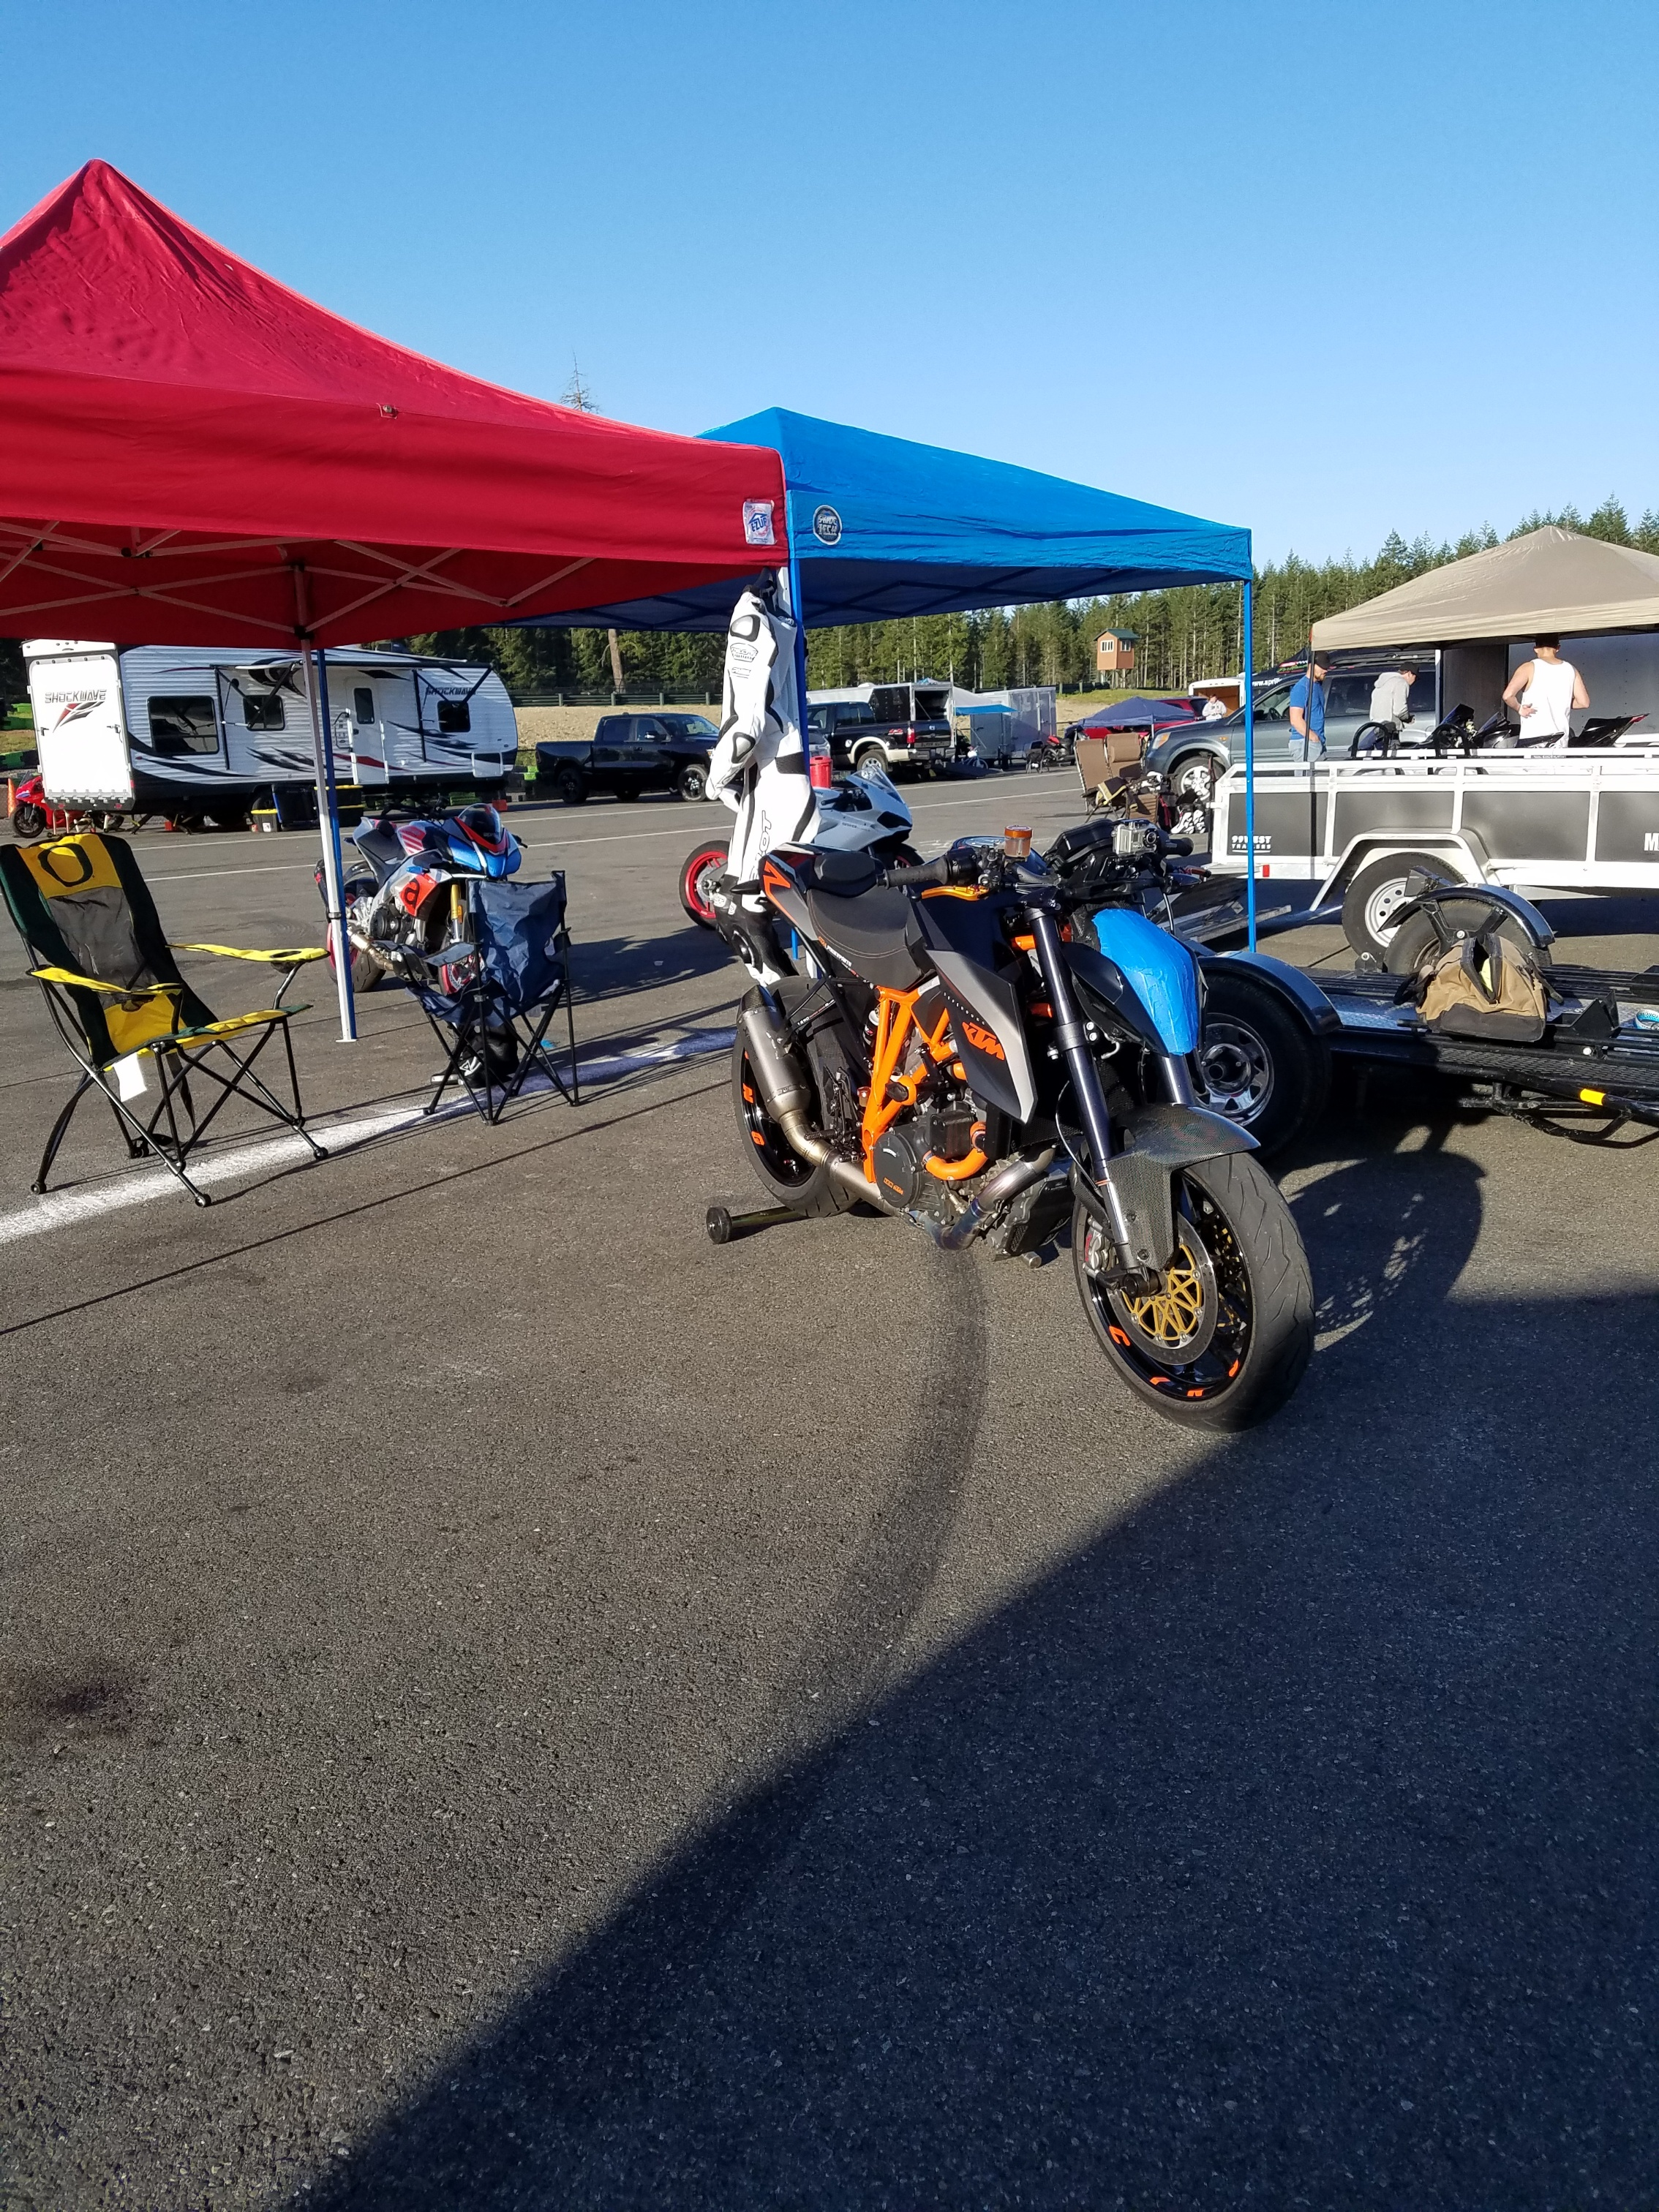 Aprilia Racers day-20190506_072700_resized.jpg